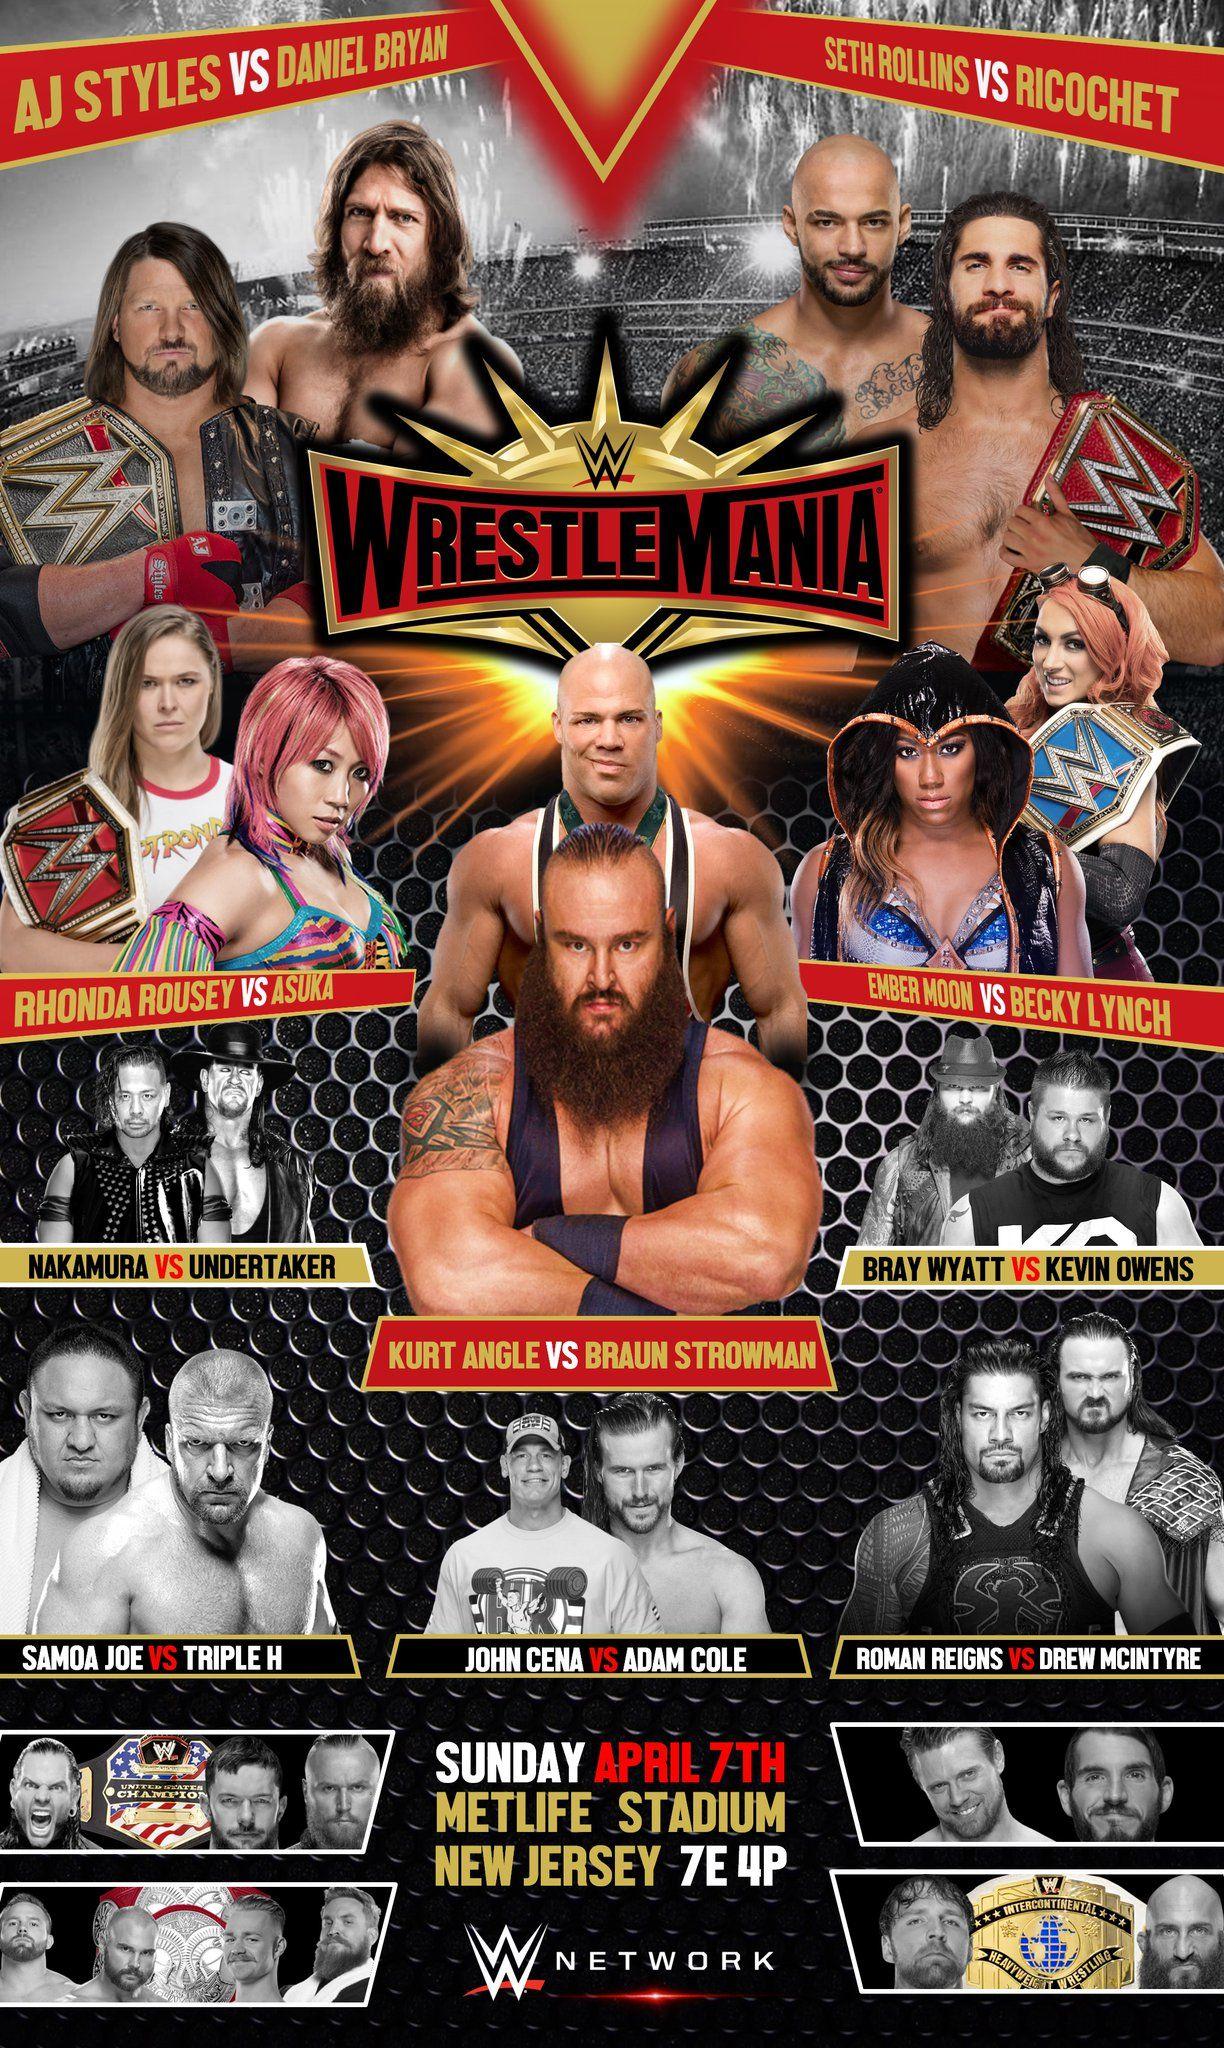 Wwe Wrestlemania 35 Poster Fantasy Match Wrestlemania 35 Wrestling Posters Wrestlemania